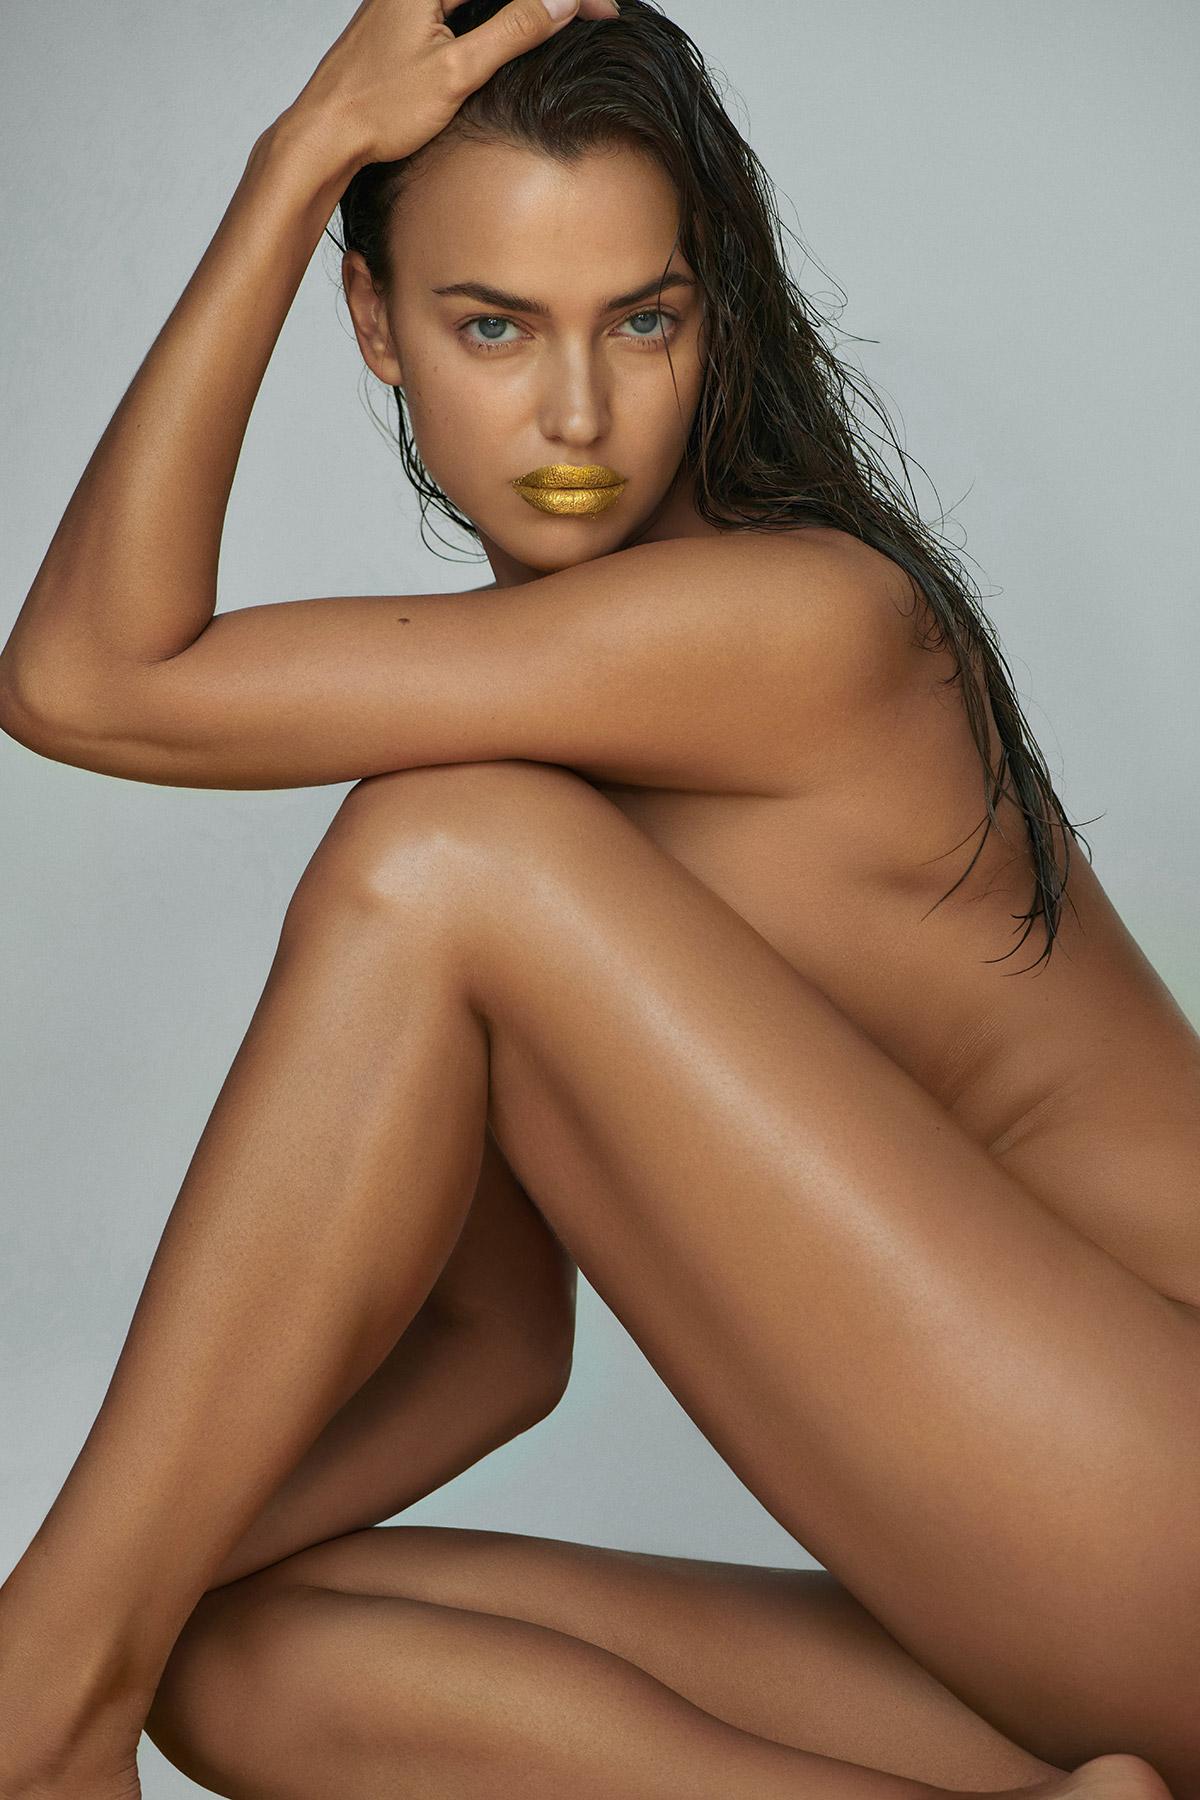 irina-shayk-x-mimi-luzon-fashionography